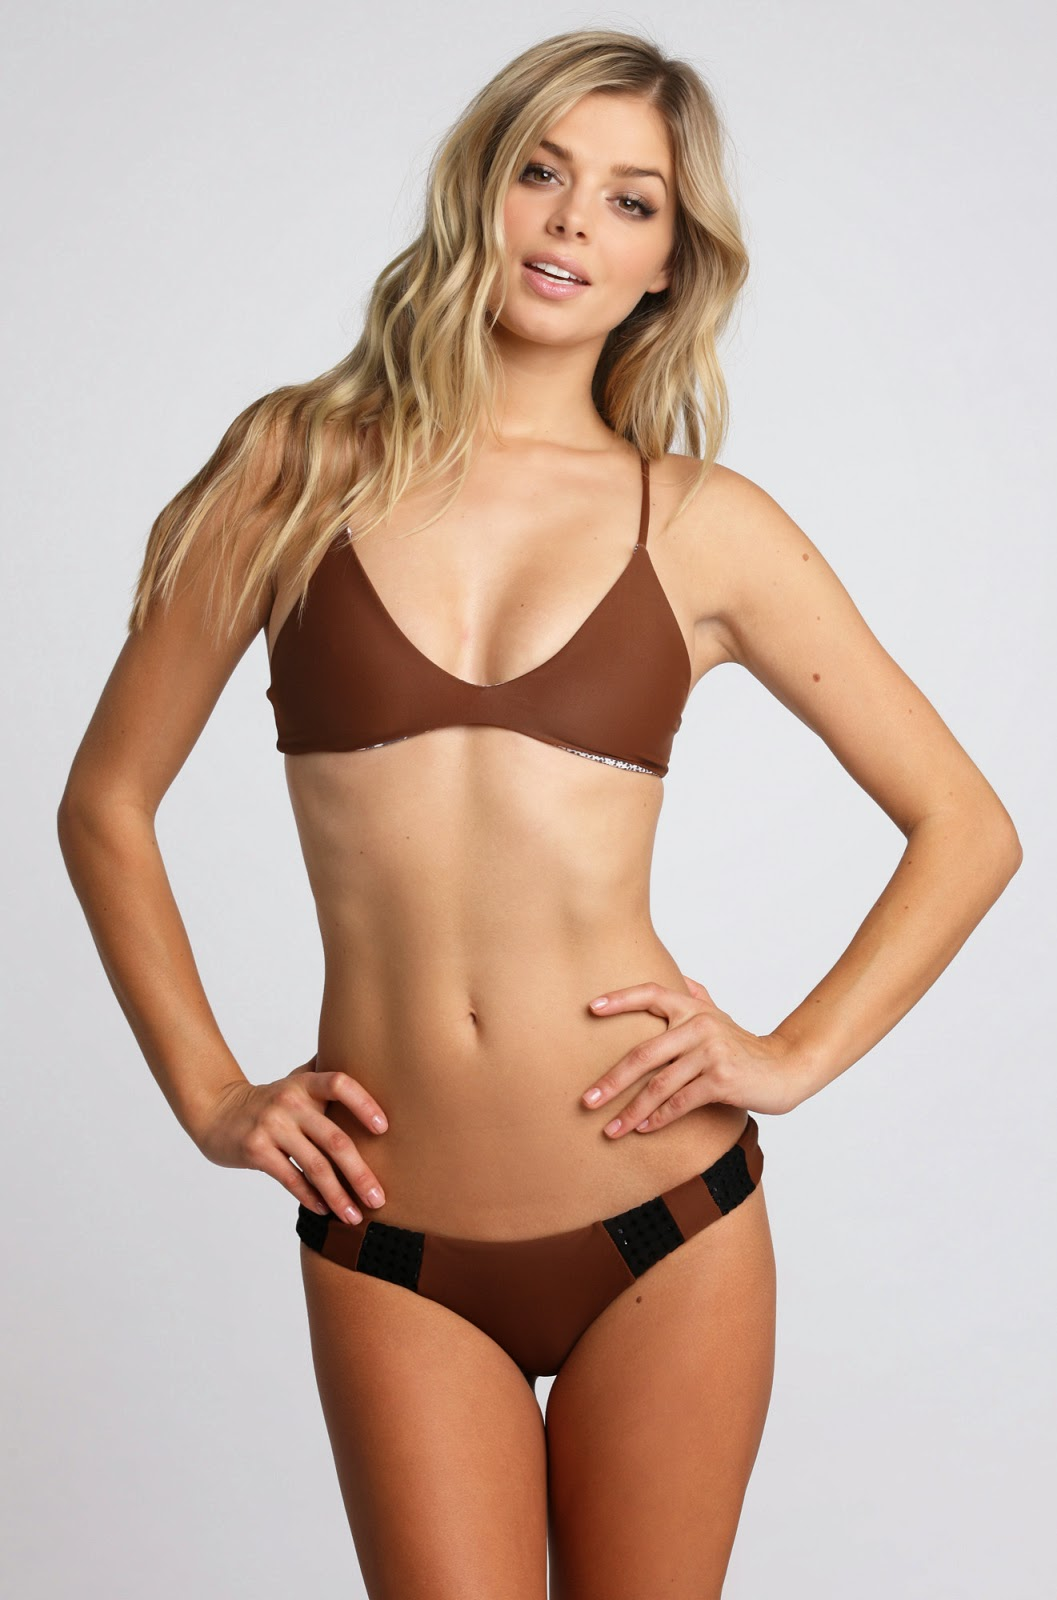 Danielle Knudson Bikini Pictures   BIKINI MODELS